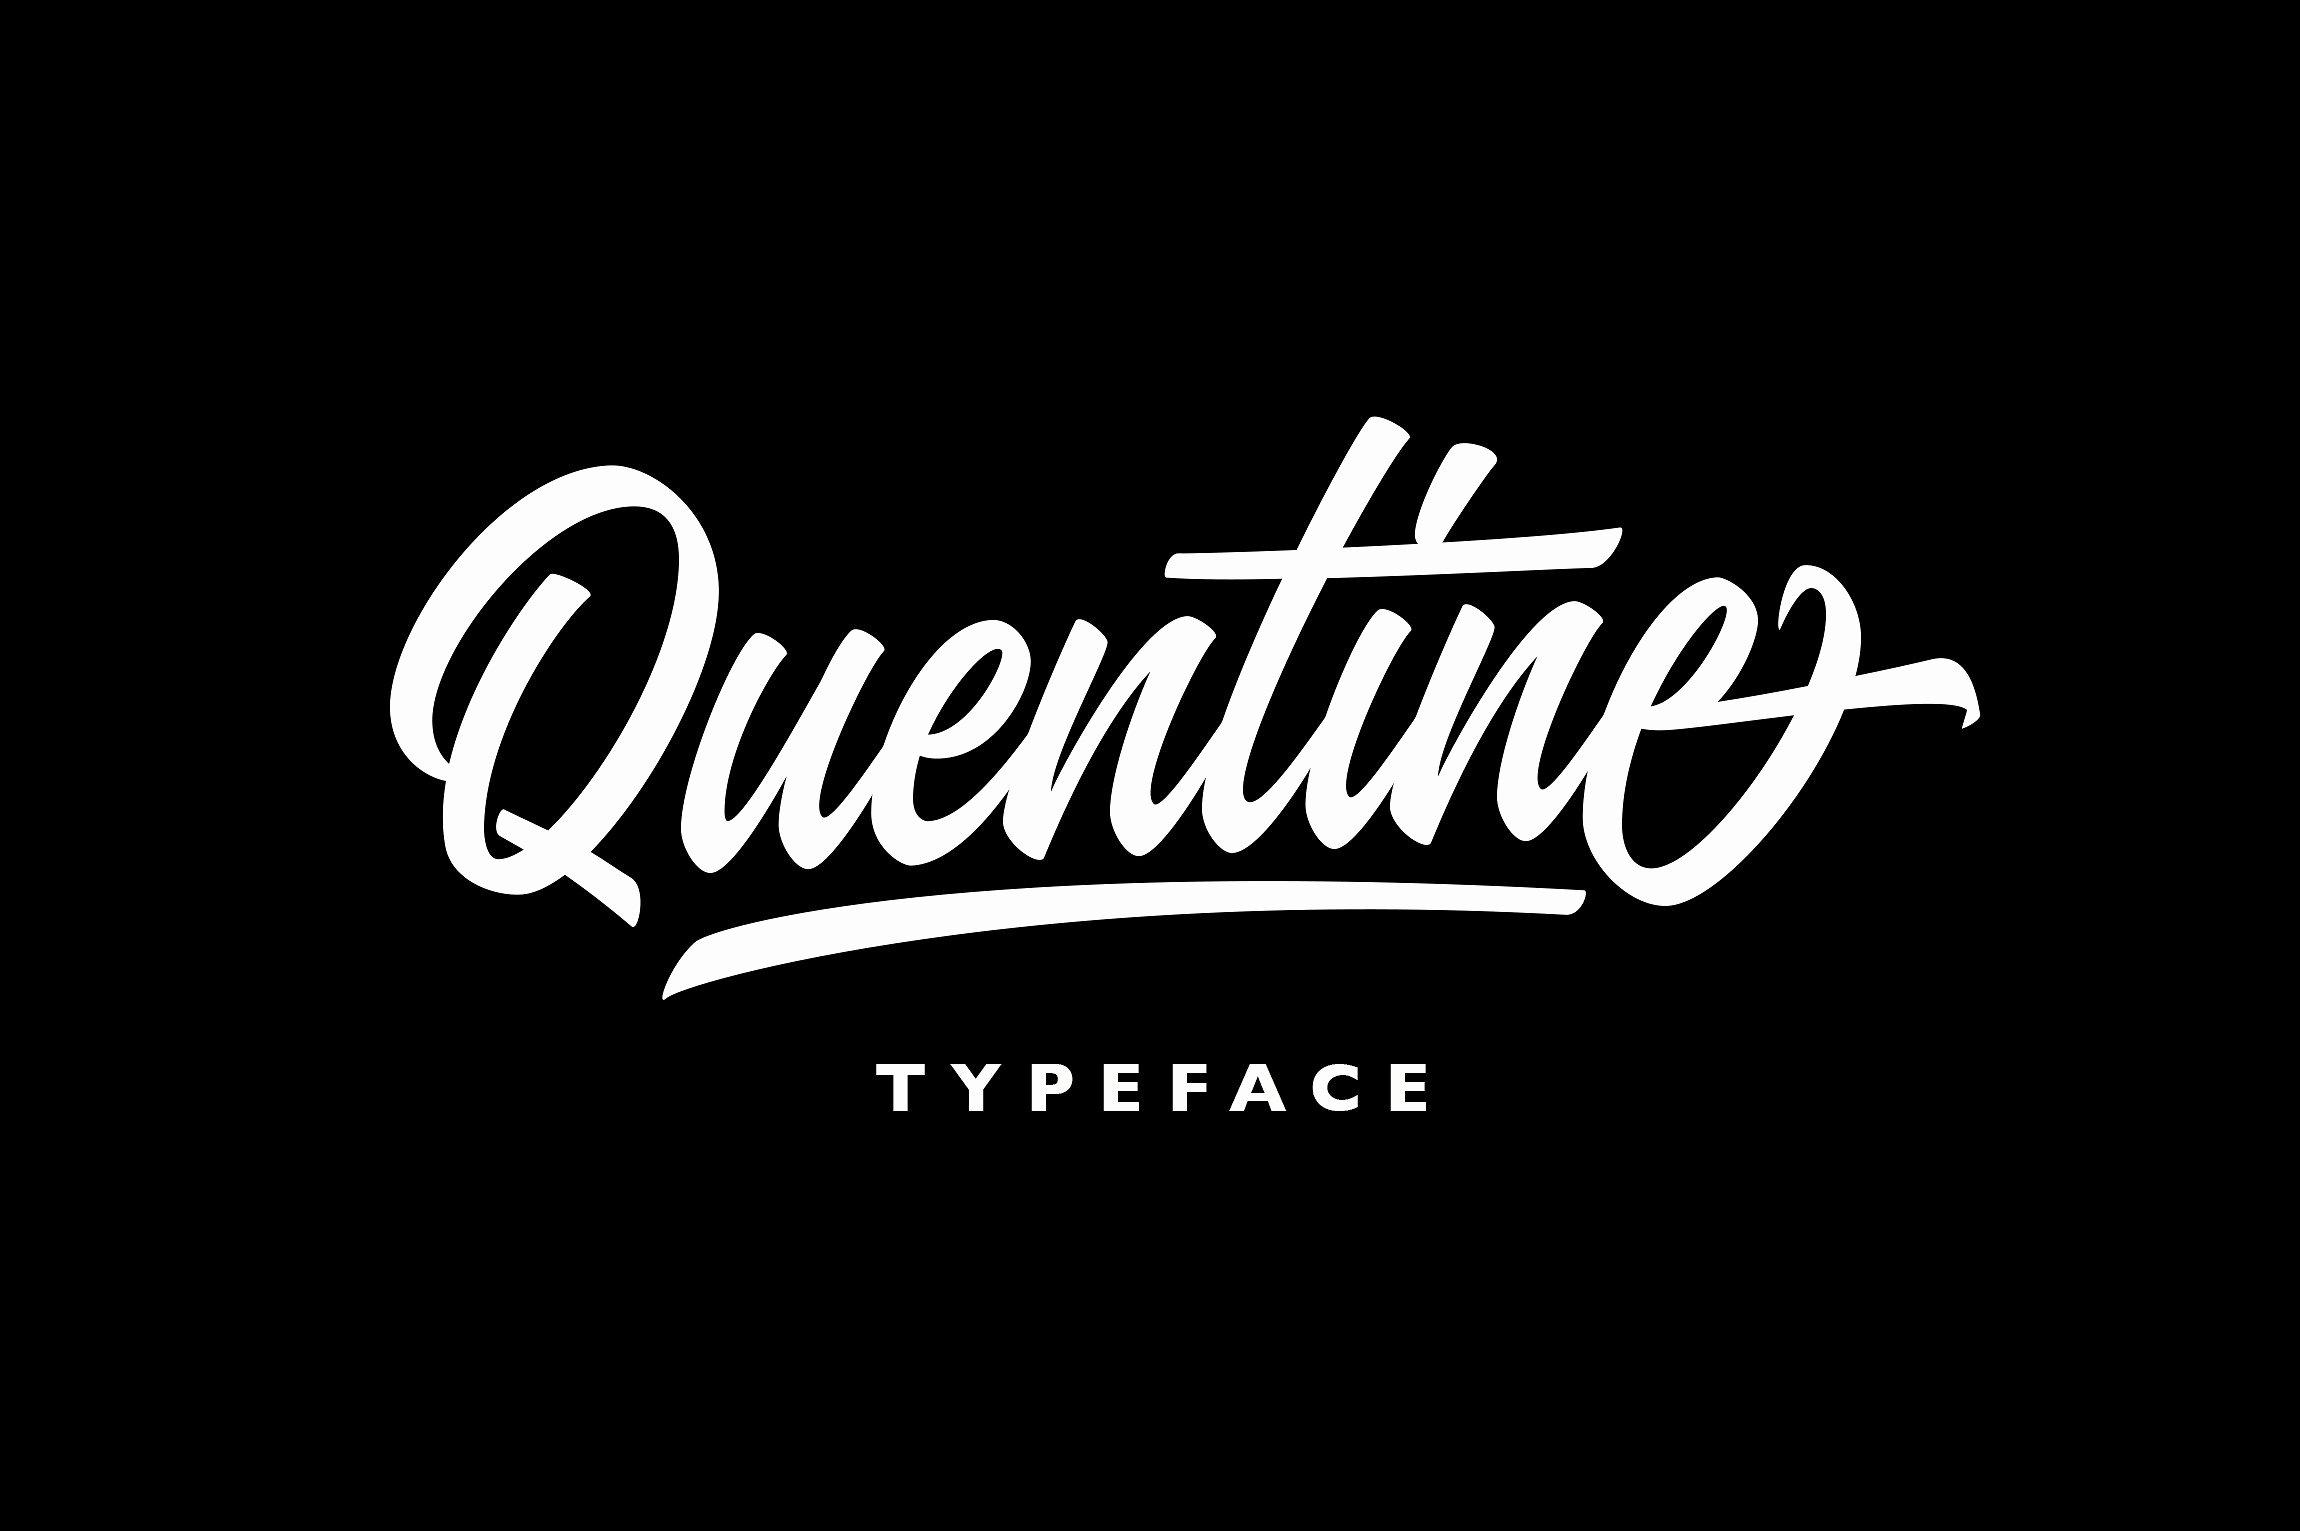 Best Fonts for T Shirts Inspirational 40 Best Calligraphy Script Fonts for Design Projects Designazure